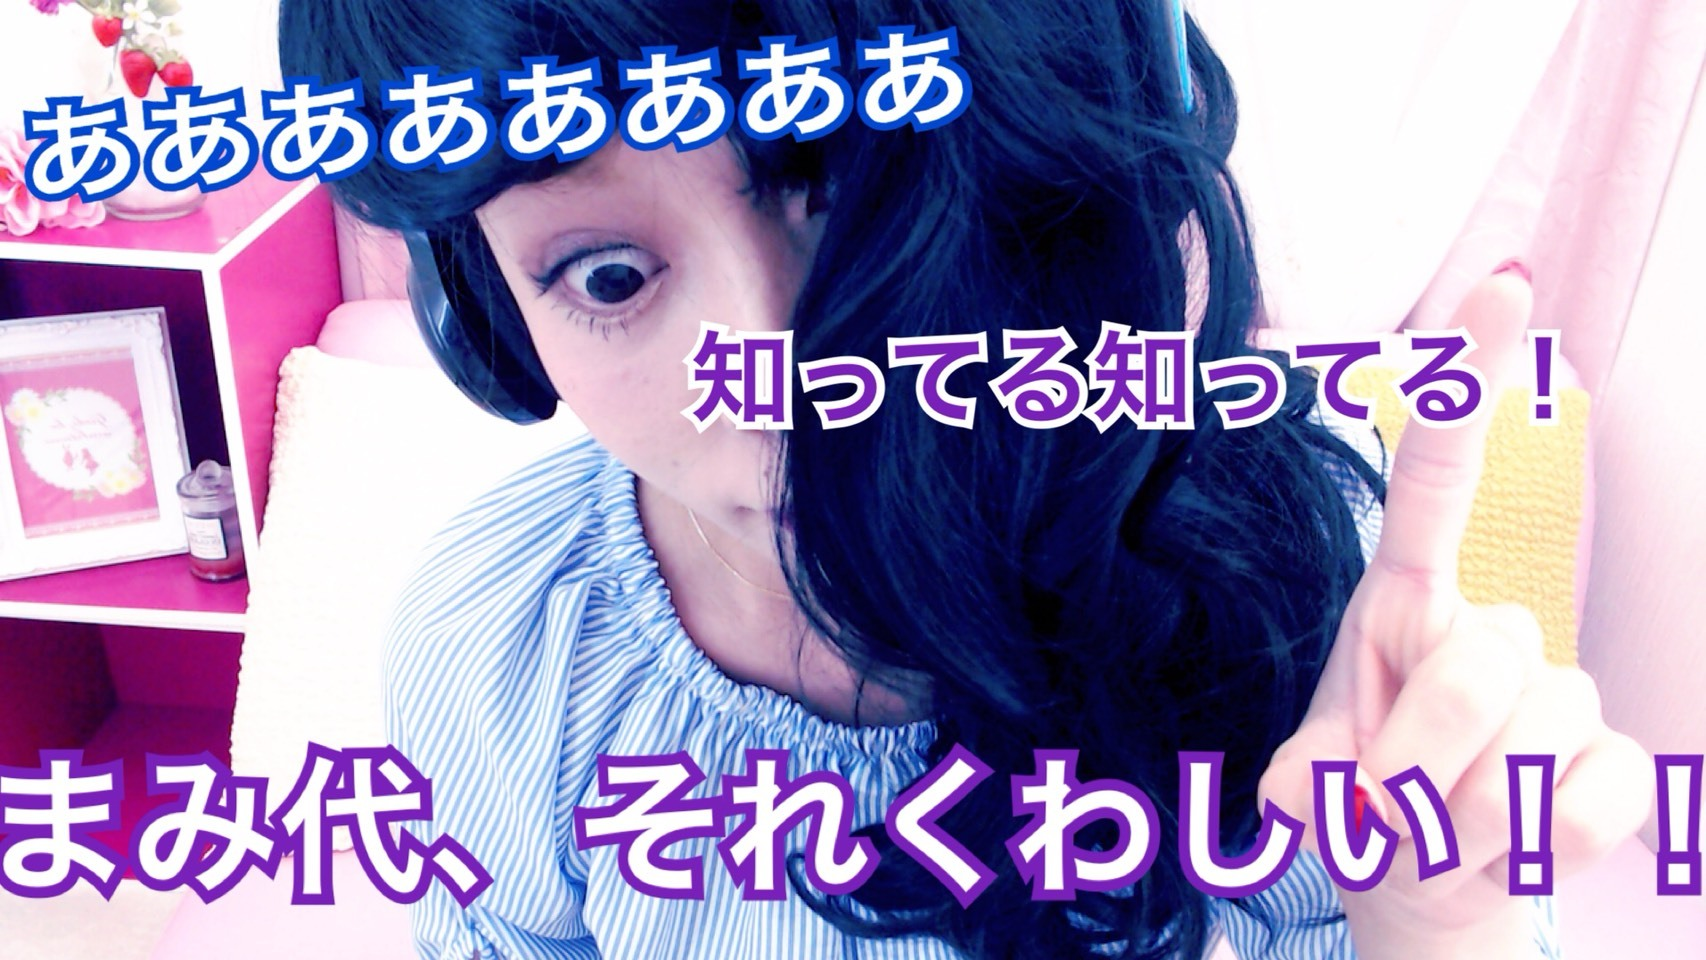 S__15736837.jpg